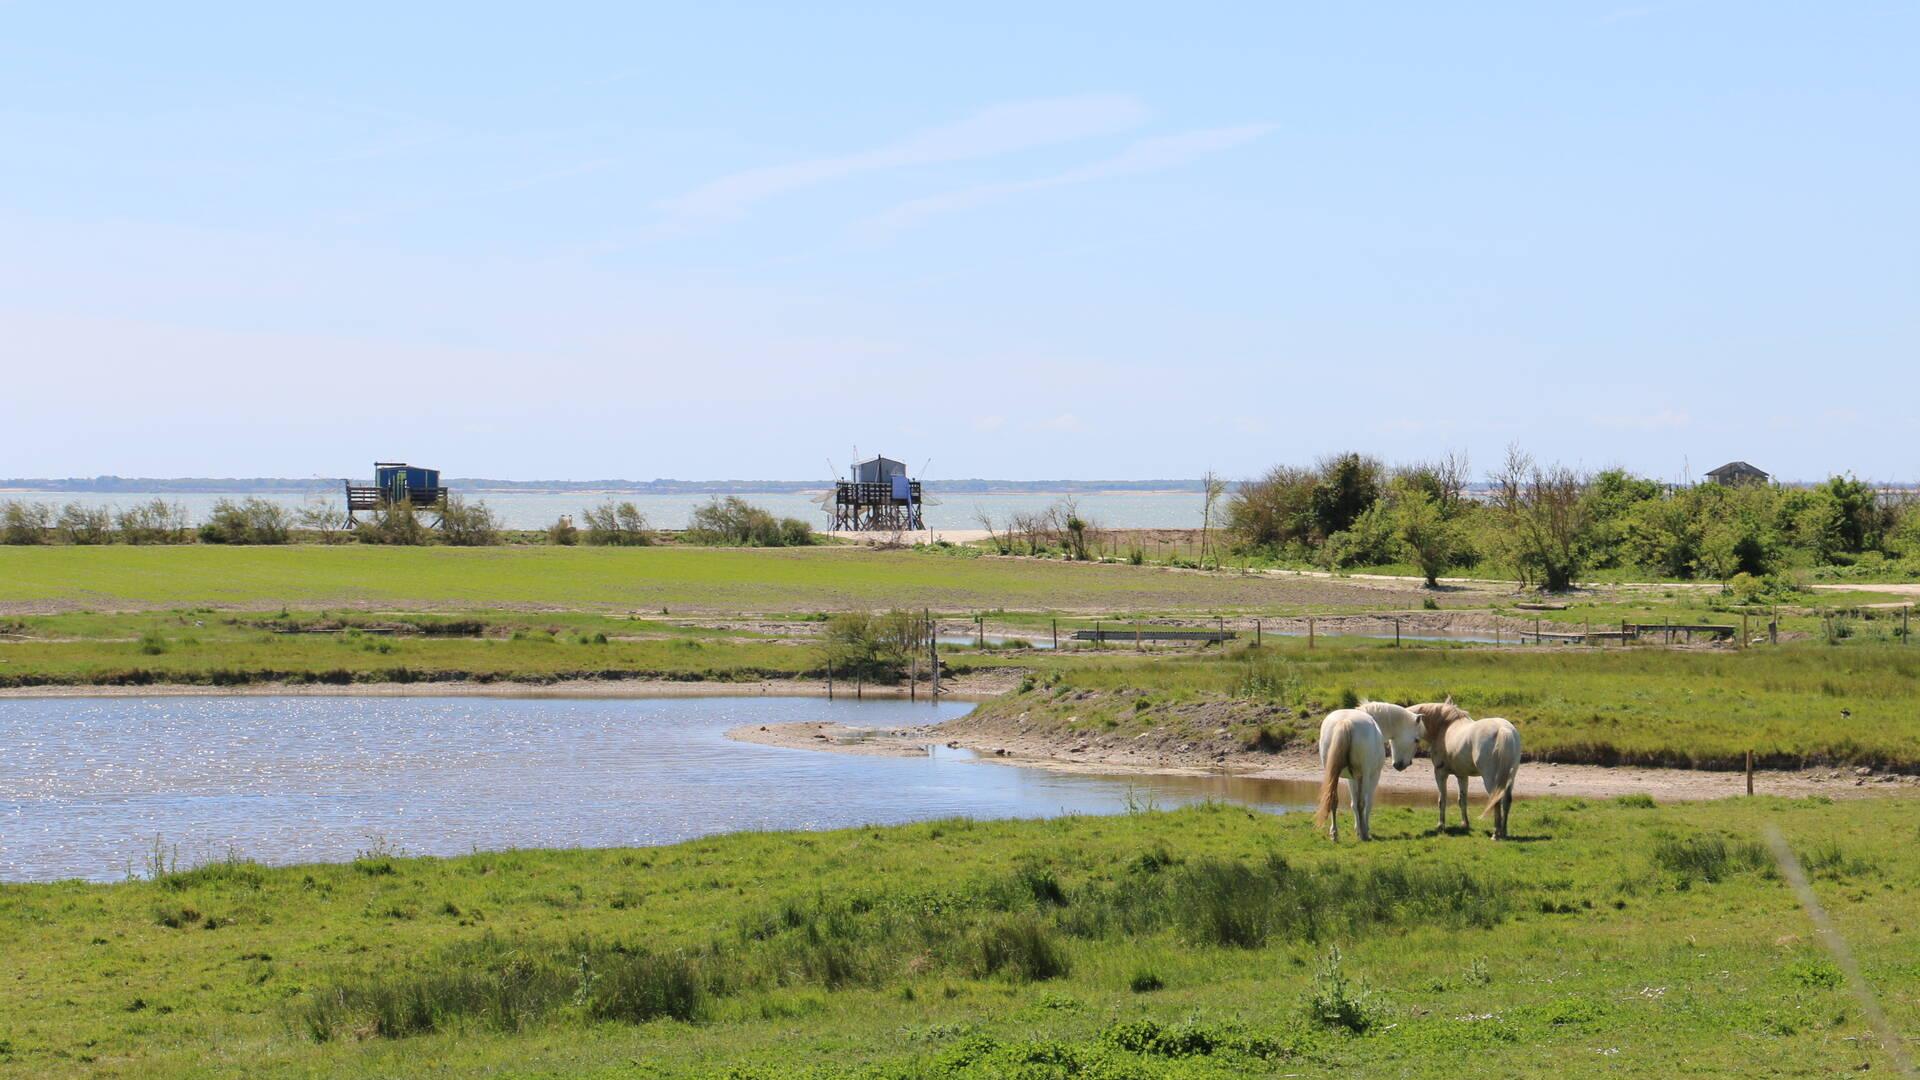 Balade à l'île Madame - Rochefort Océan